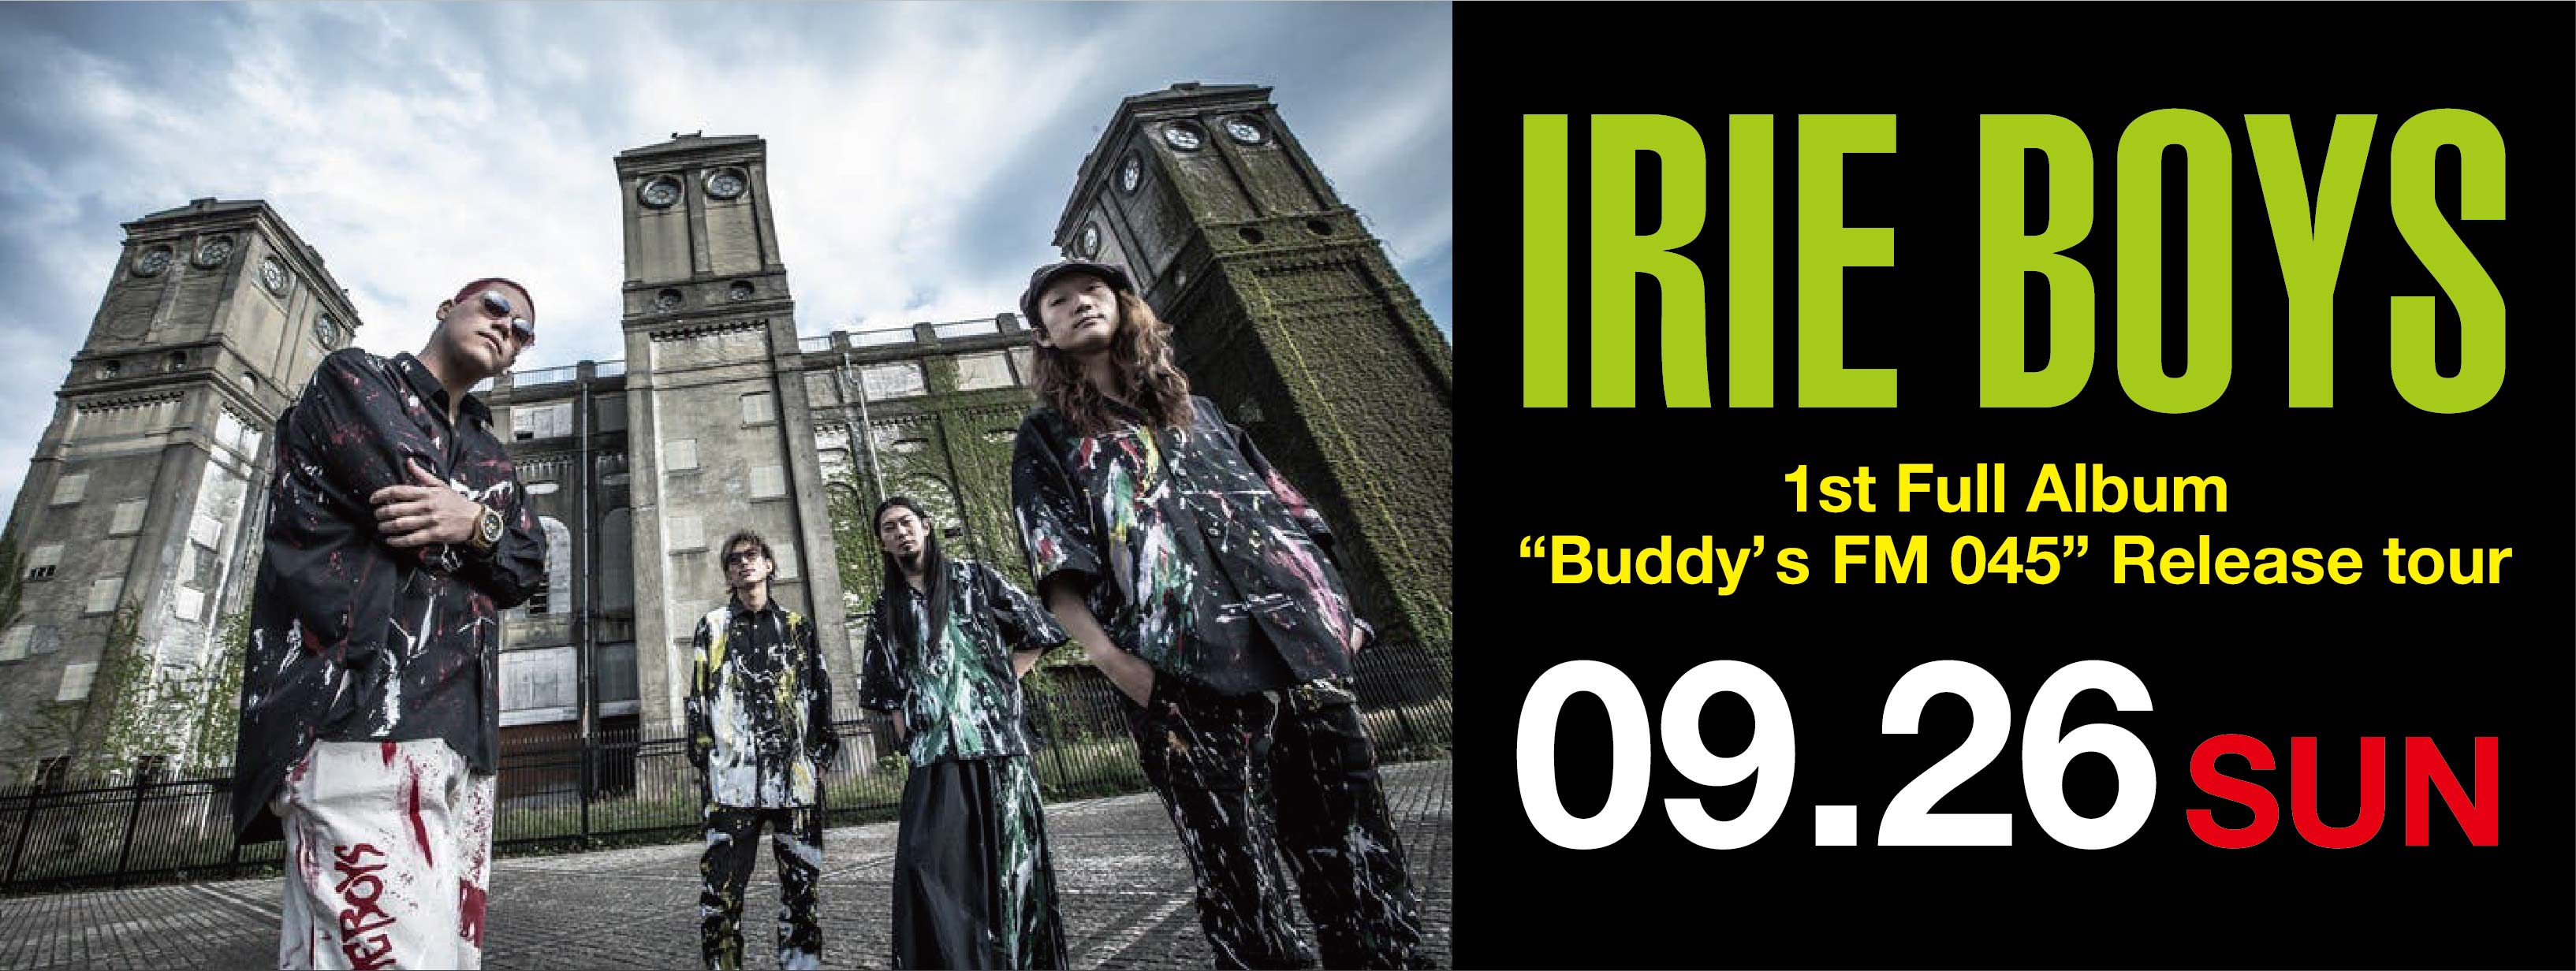 "IRIE BOYS 1st Full Album ""Buddy's FM 045"" Release tour"